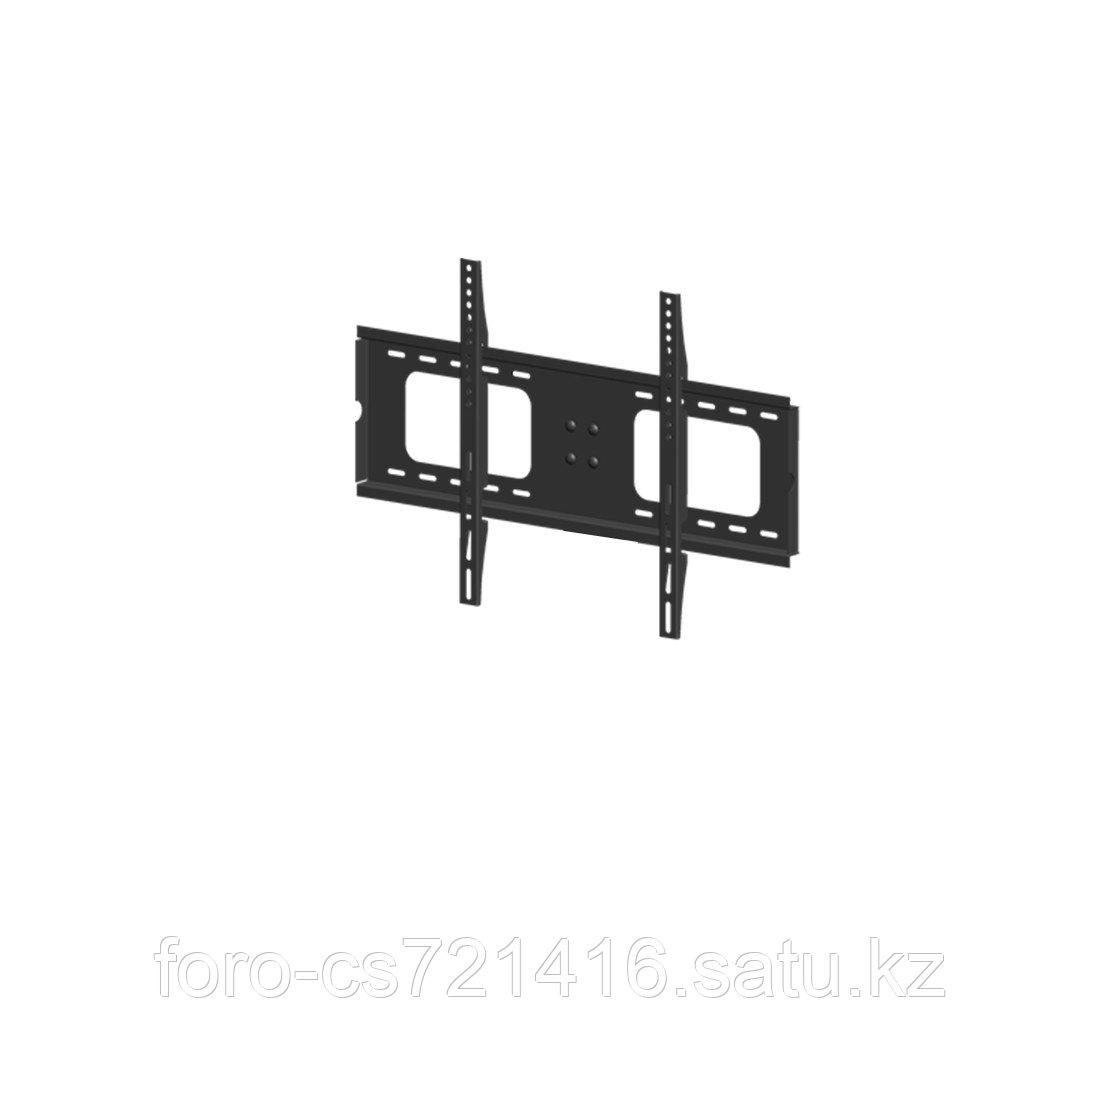 Кронштейн для монитора Dahua DHL32-S200/42/43/49/55-BG